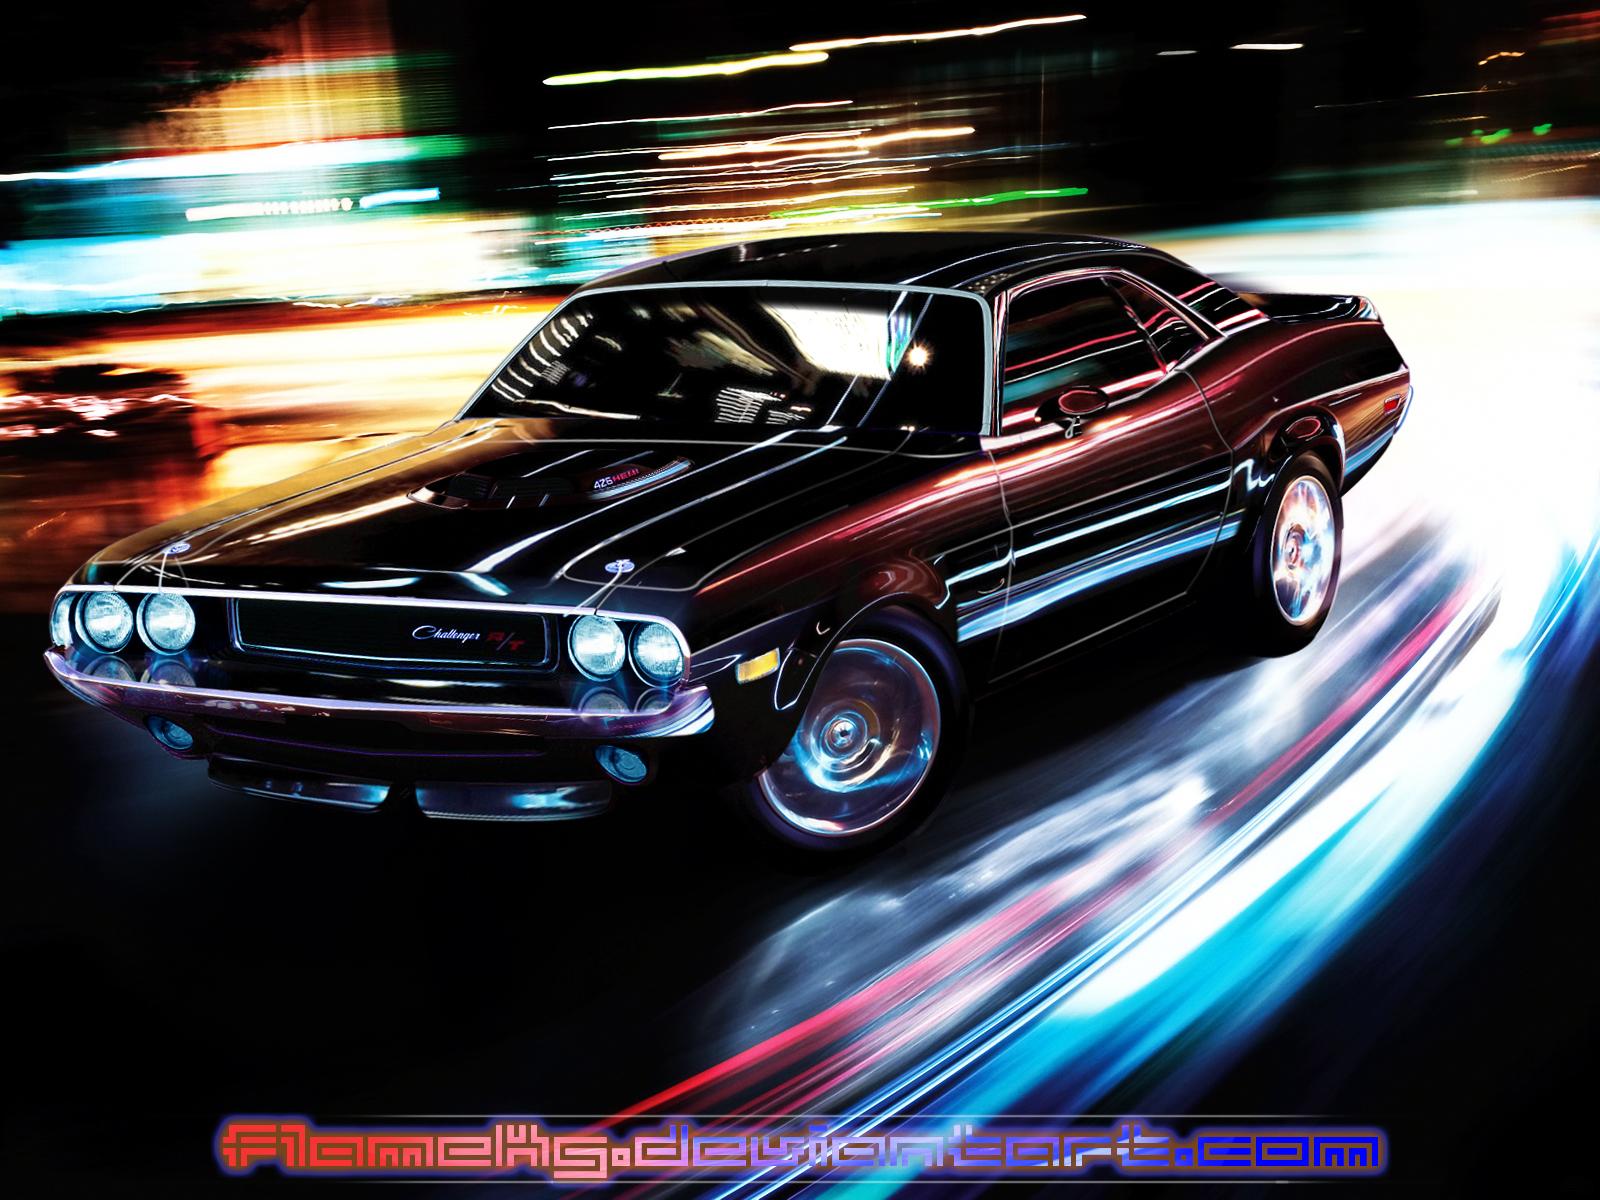 Dodge_Challenger_HEMI_by_Flameks.jpg